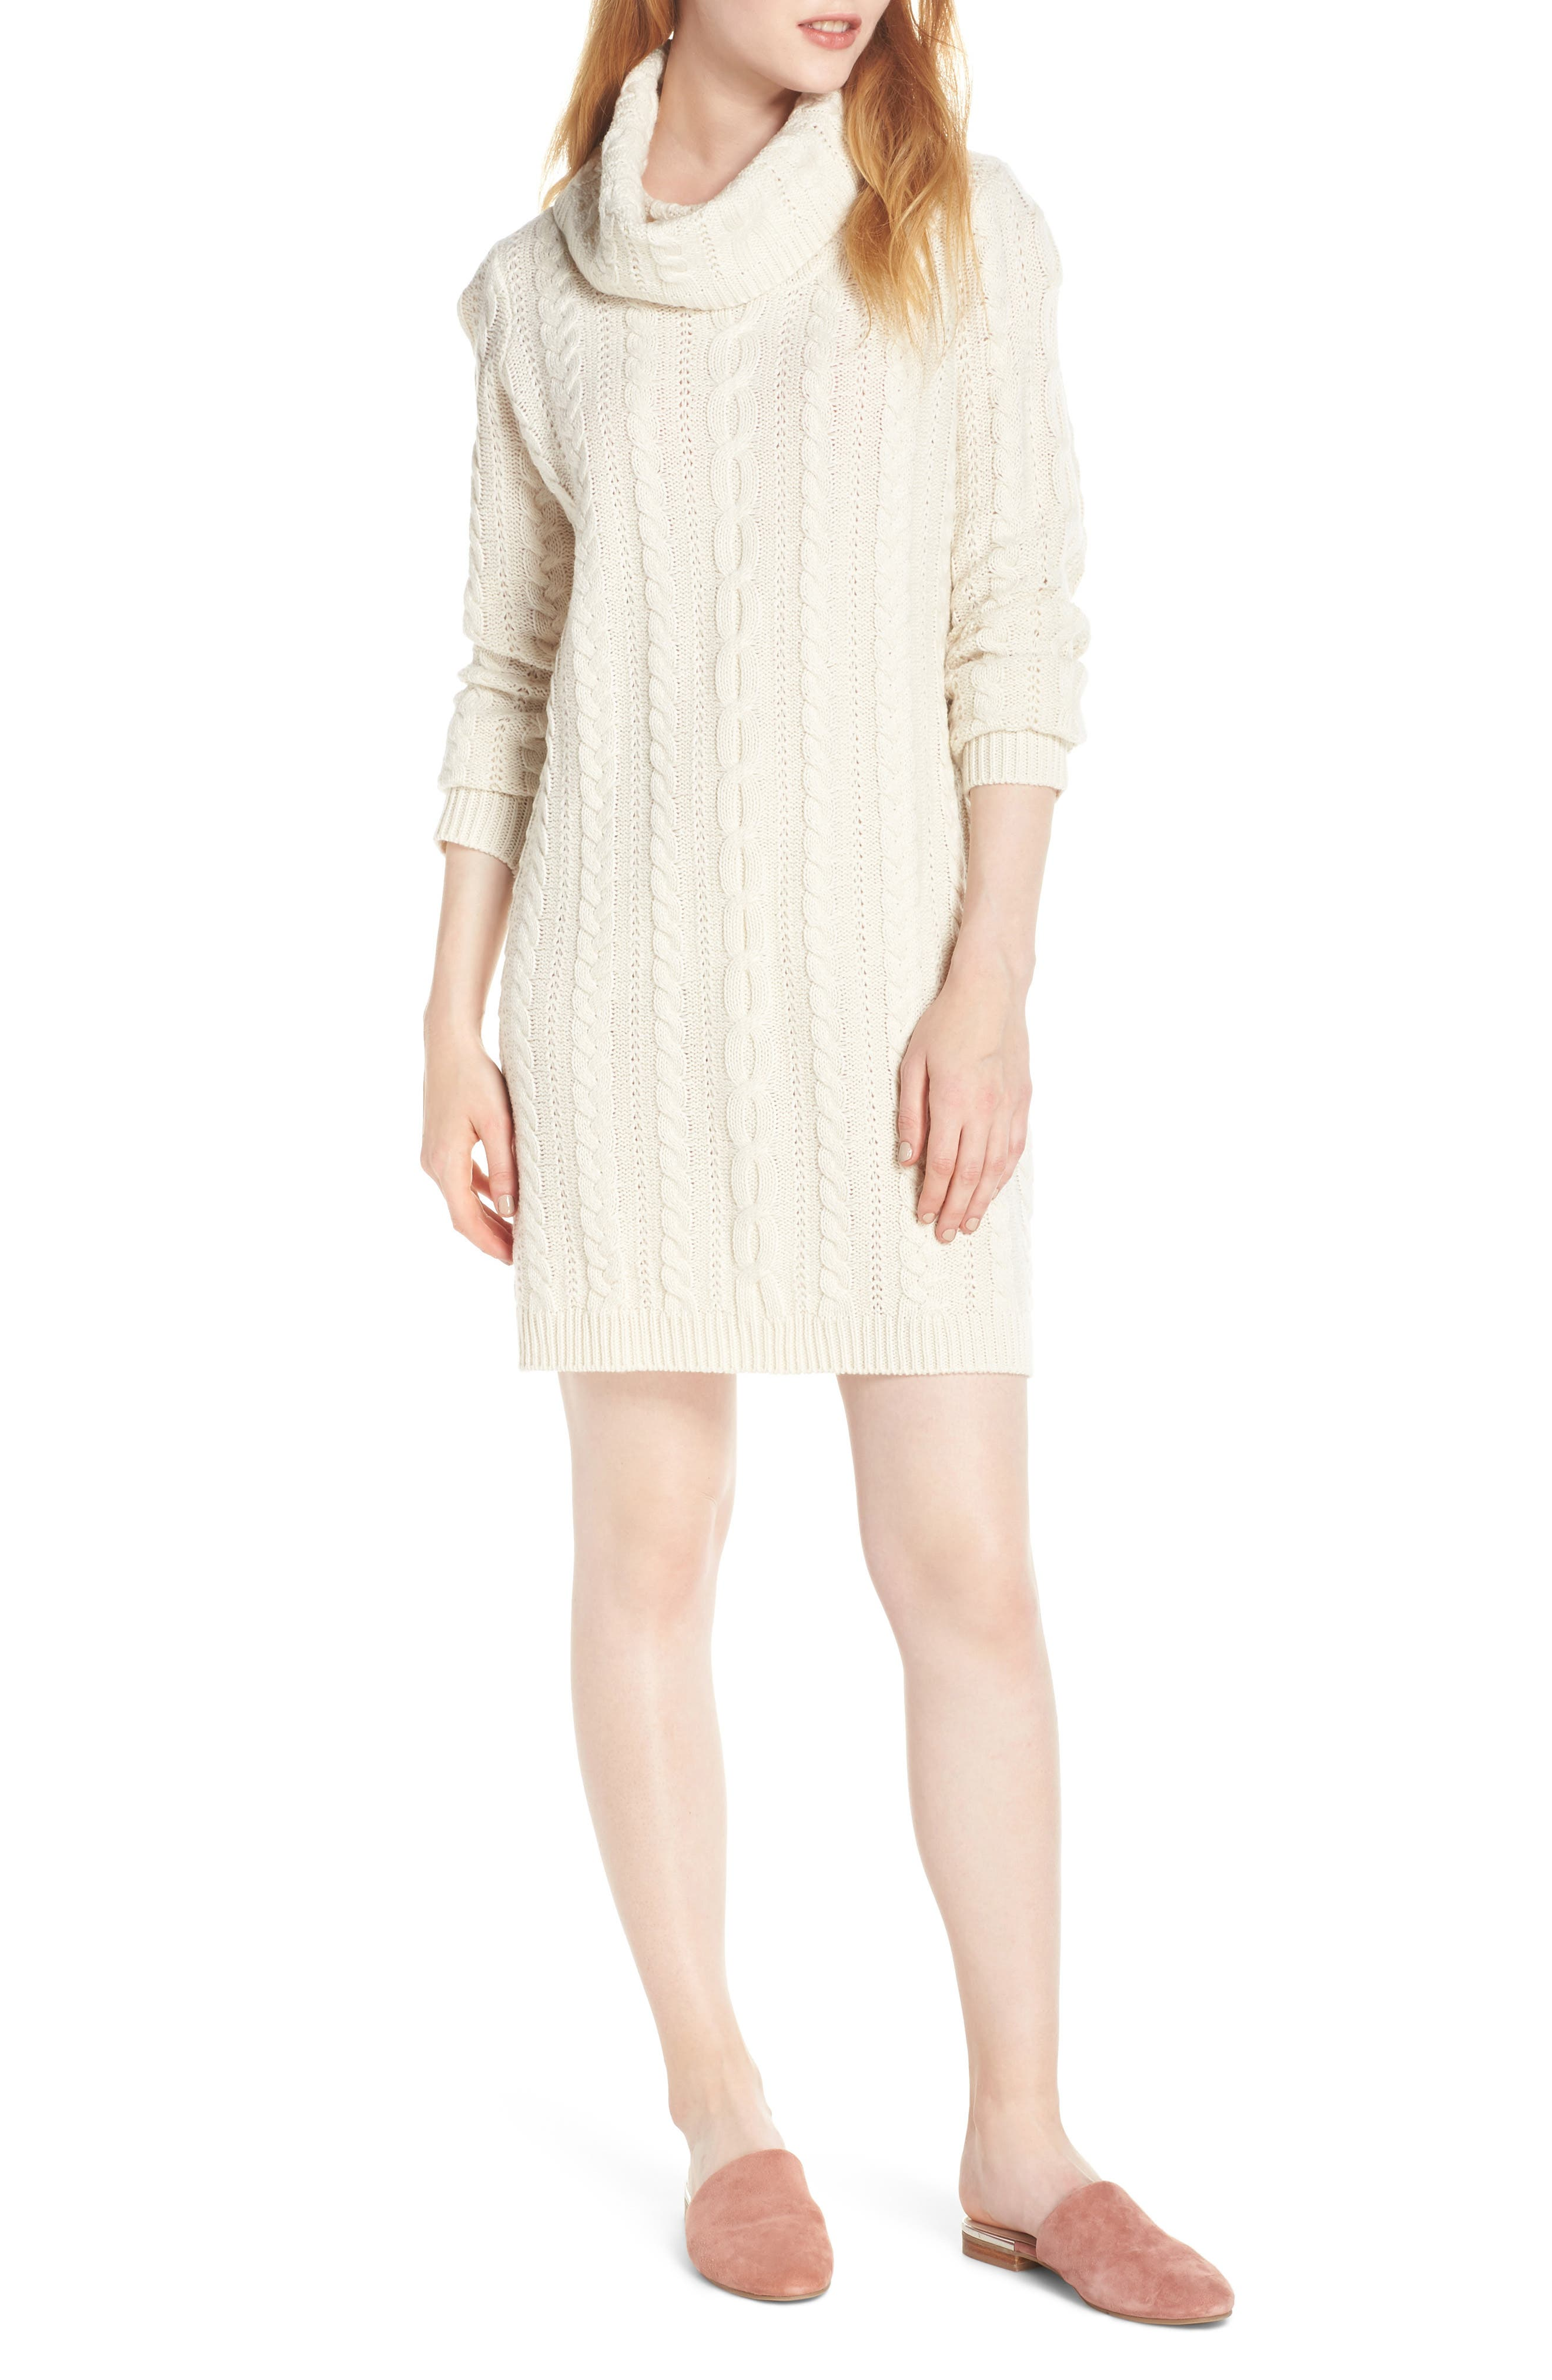 Bb Dakota Cowl Neck Cable Sweater Dress